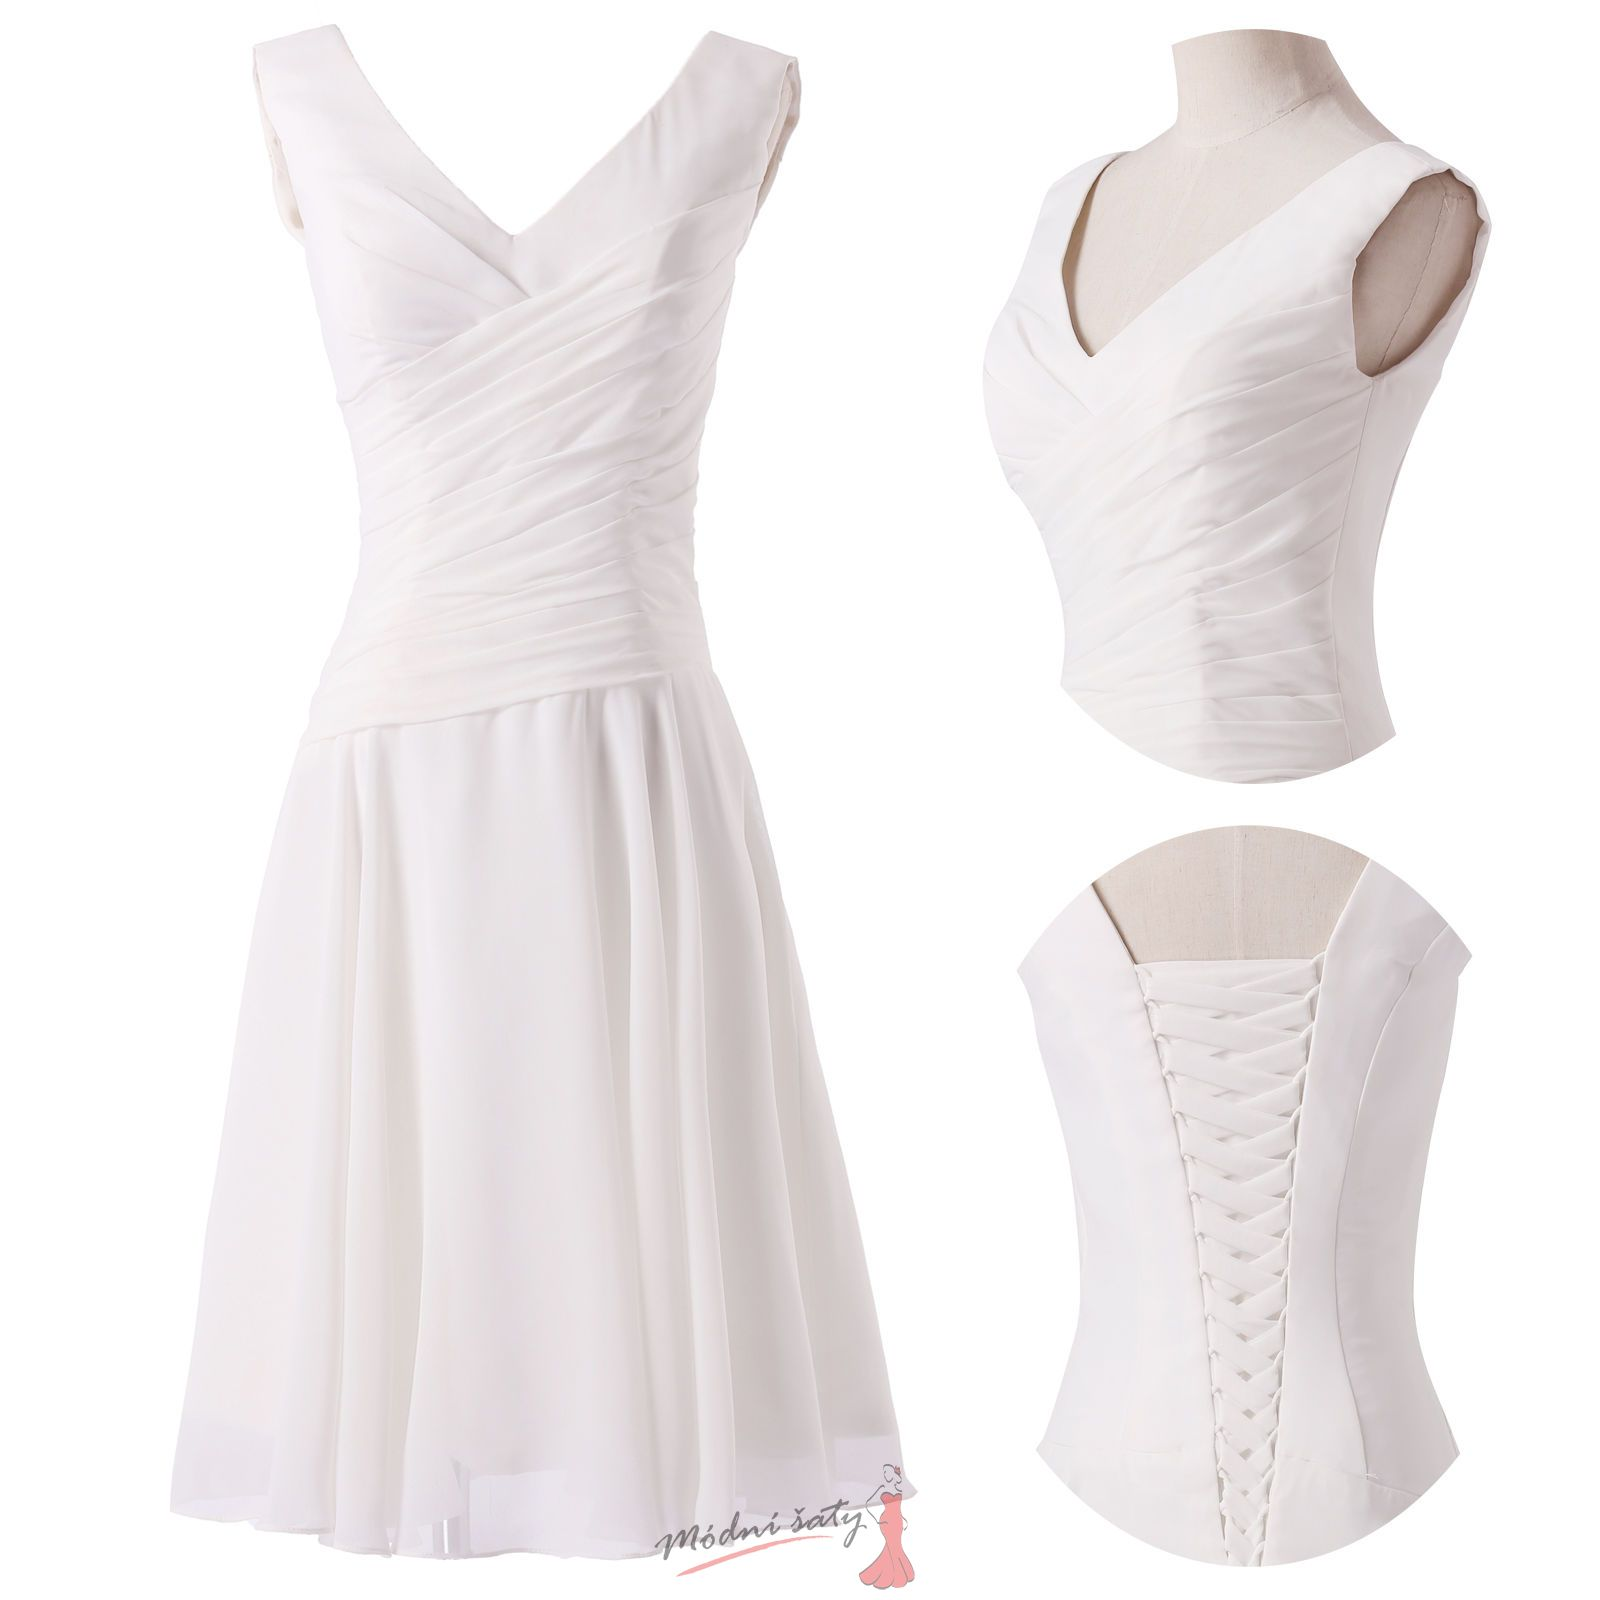 Bílé koktejlové šaty 4c816a379d